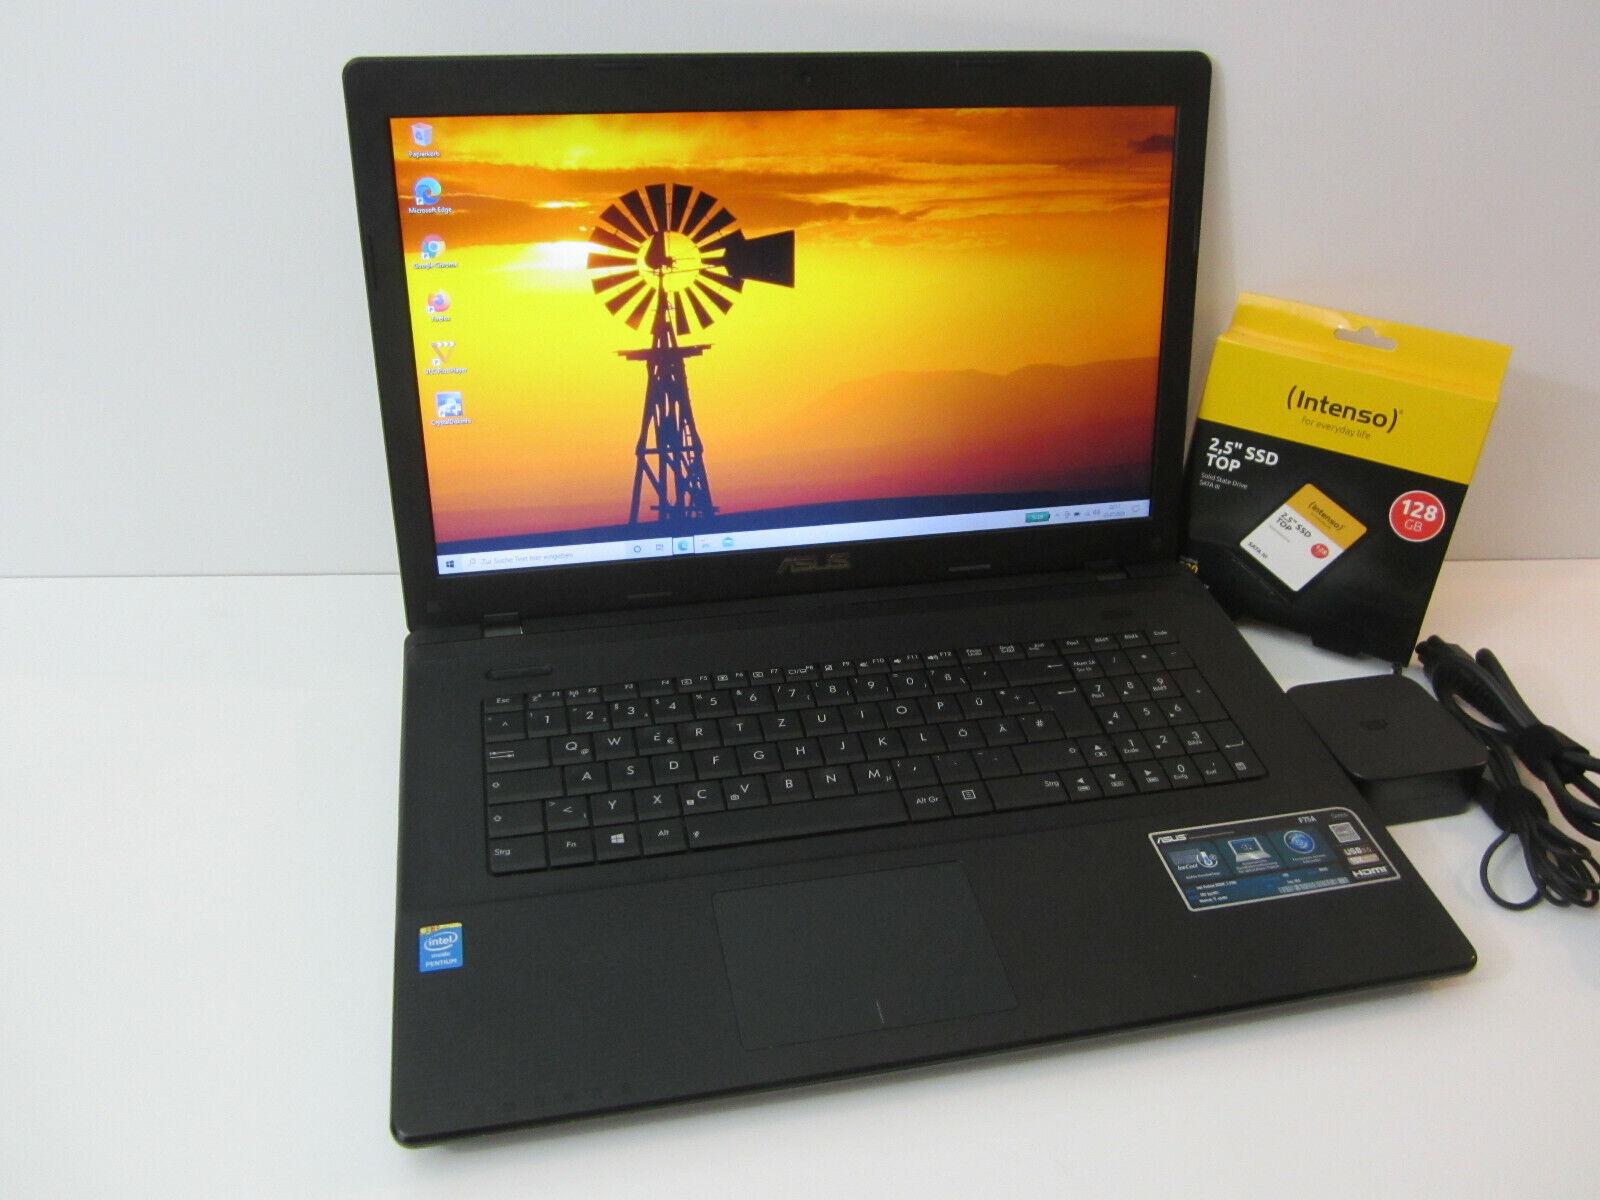 ASUS F75A / 17,3 Zoll Display / 8GB RAM / SSD-Festplatte / Windows 10 / TOP